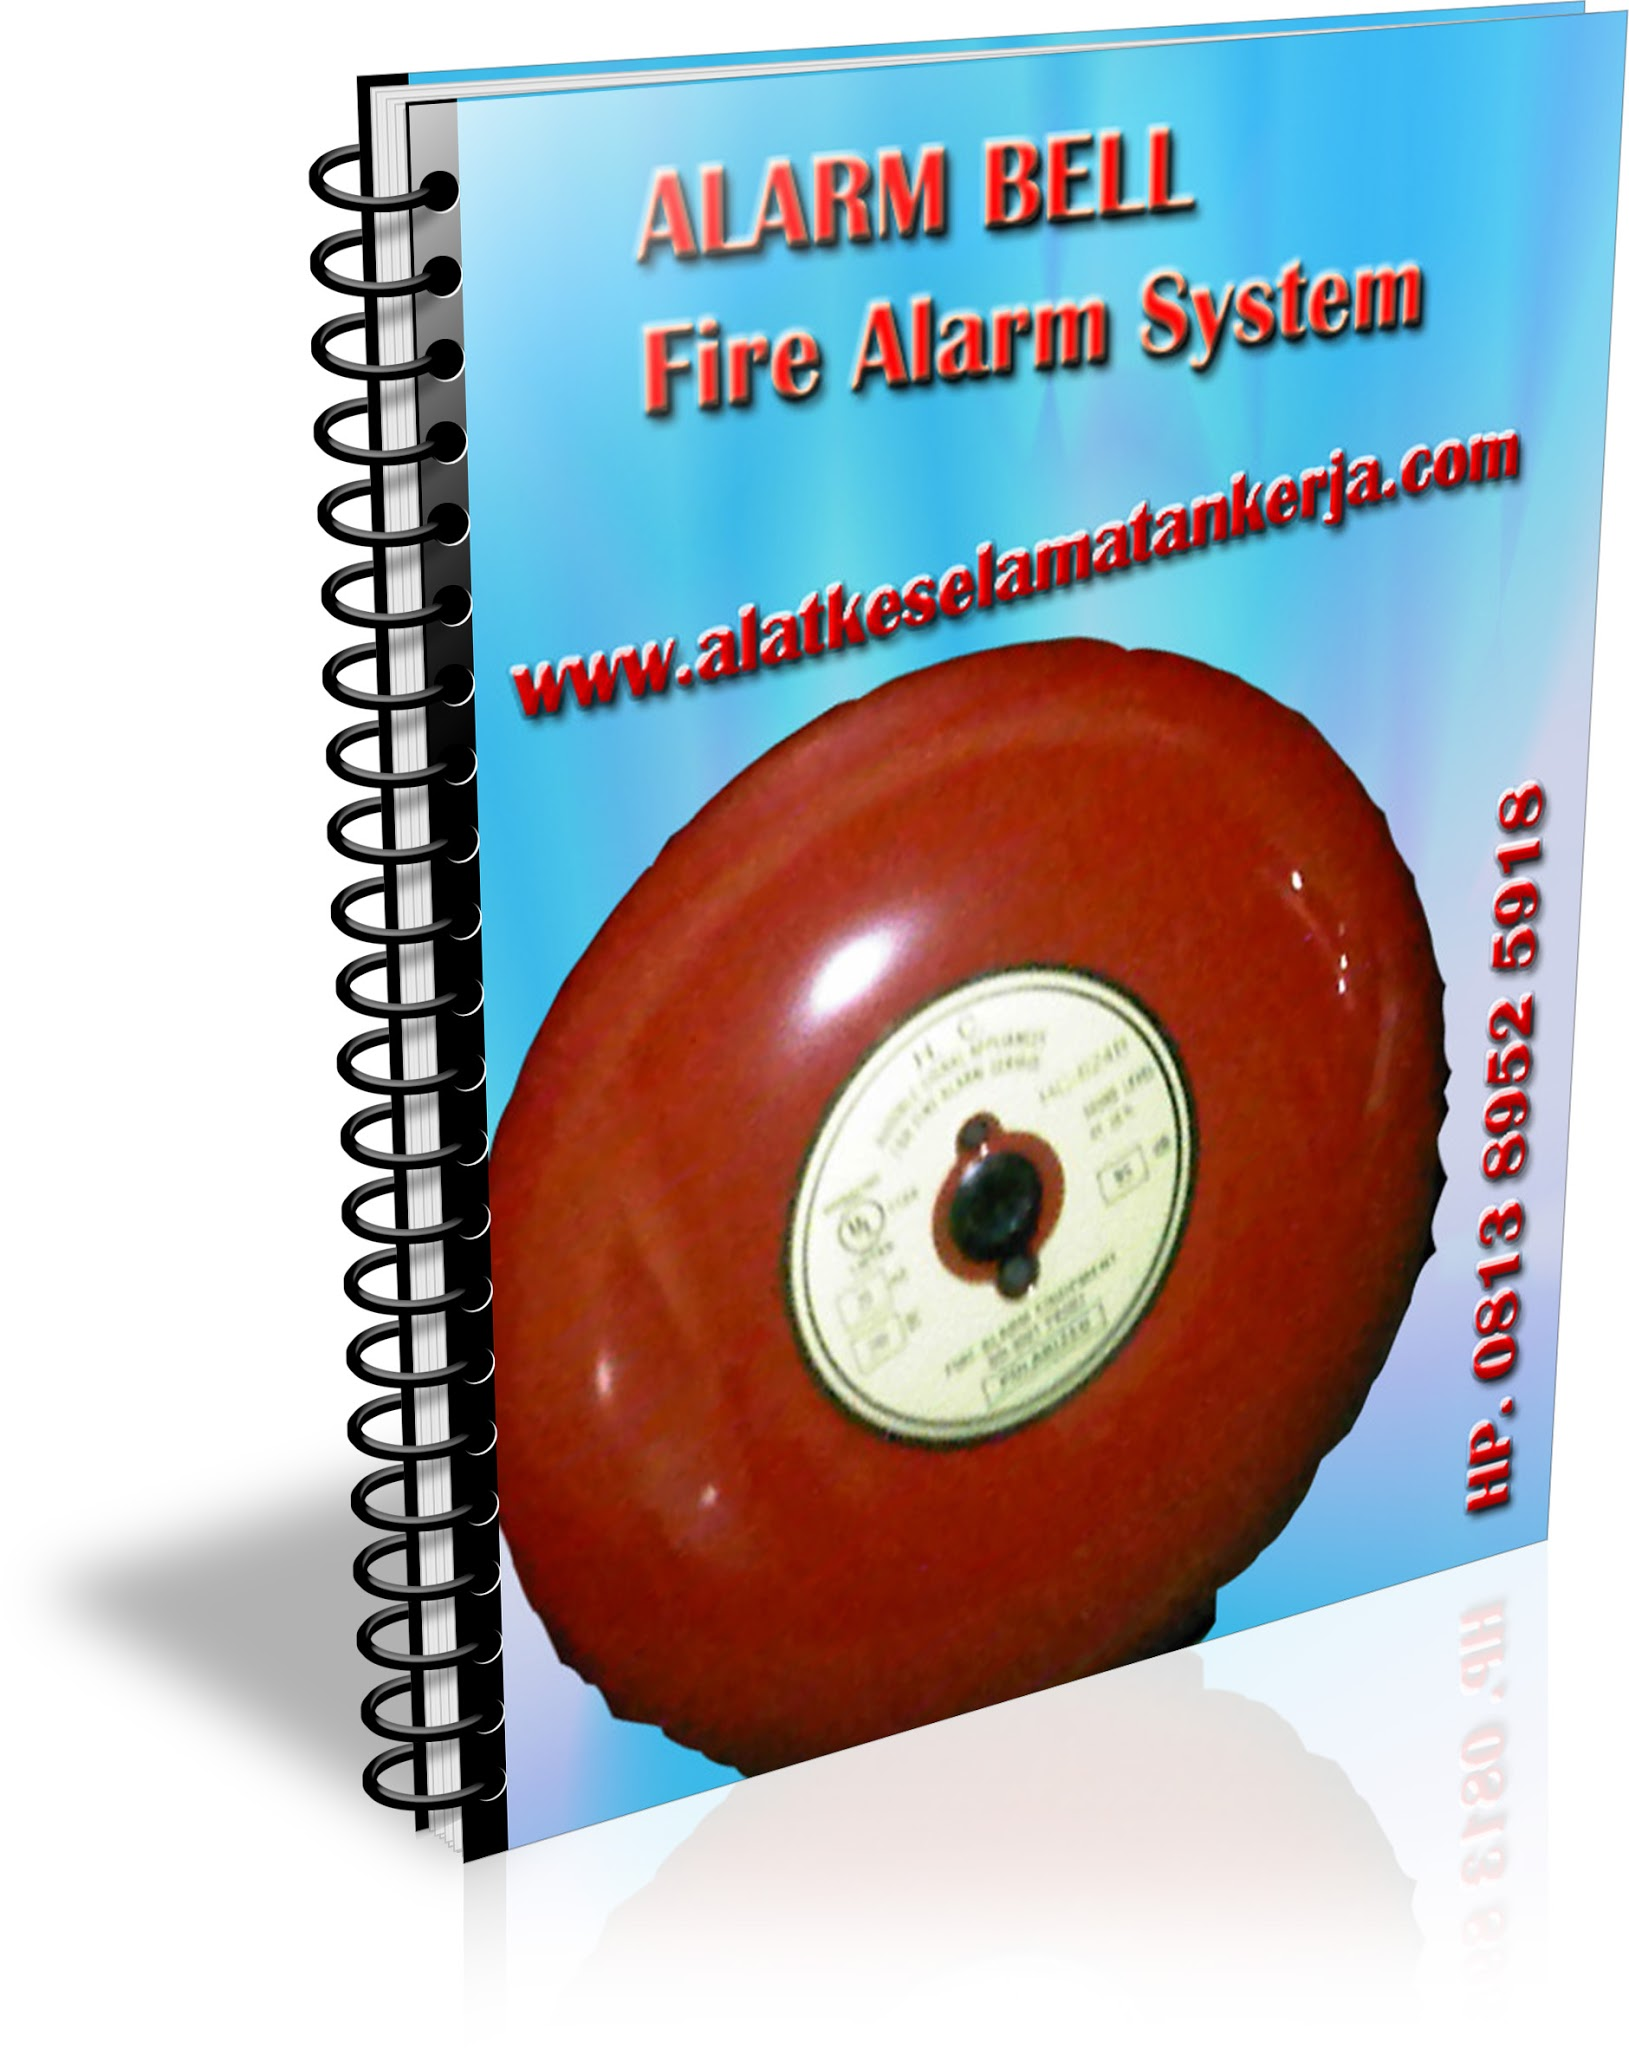 detektor asap, alarm n, alarm kecil, fungsi fire alarm system, smoke detector 12v, alarm bell 220v, alarm gsm system, alarm bell 24vdc, premier texecom, alarm bts